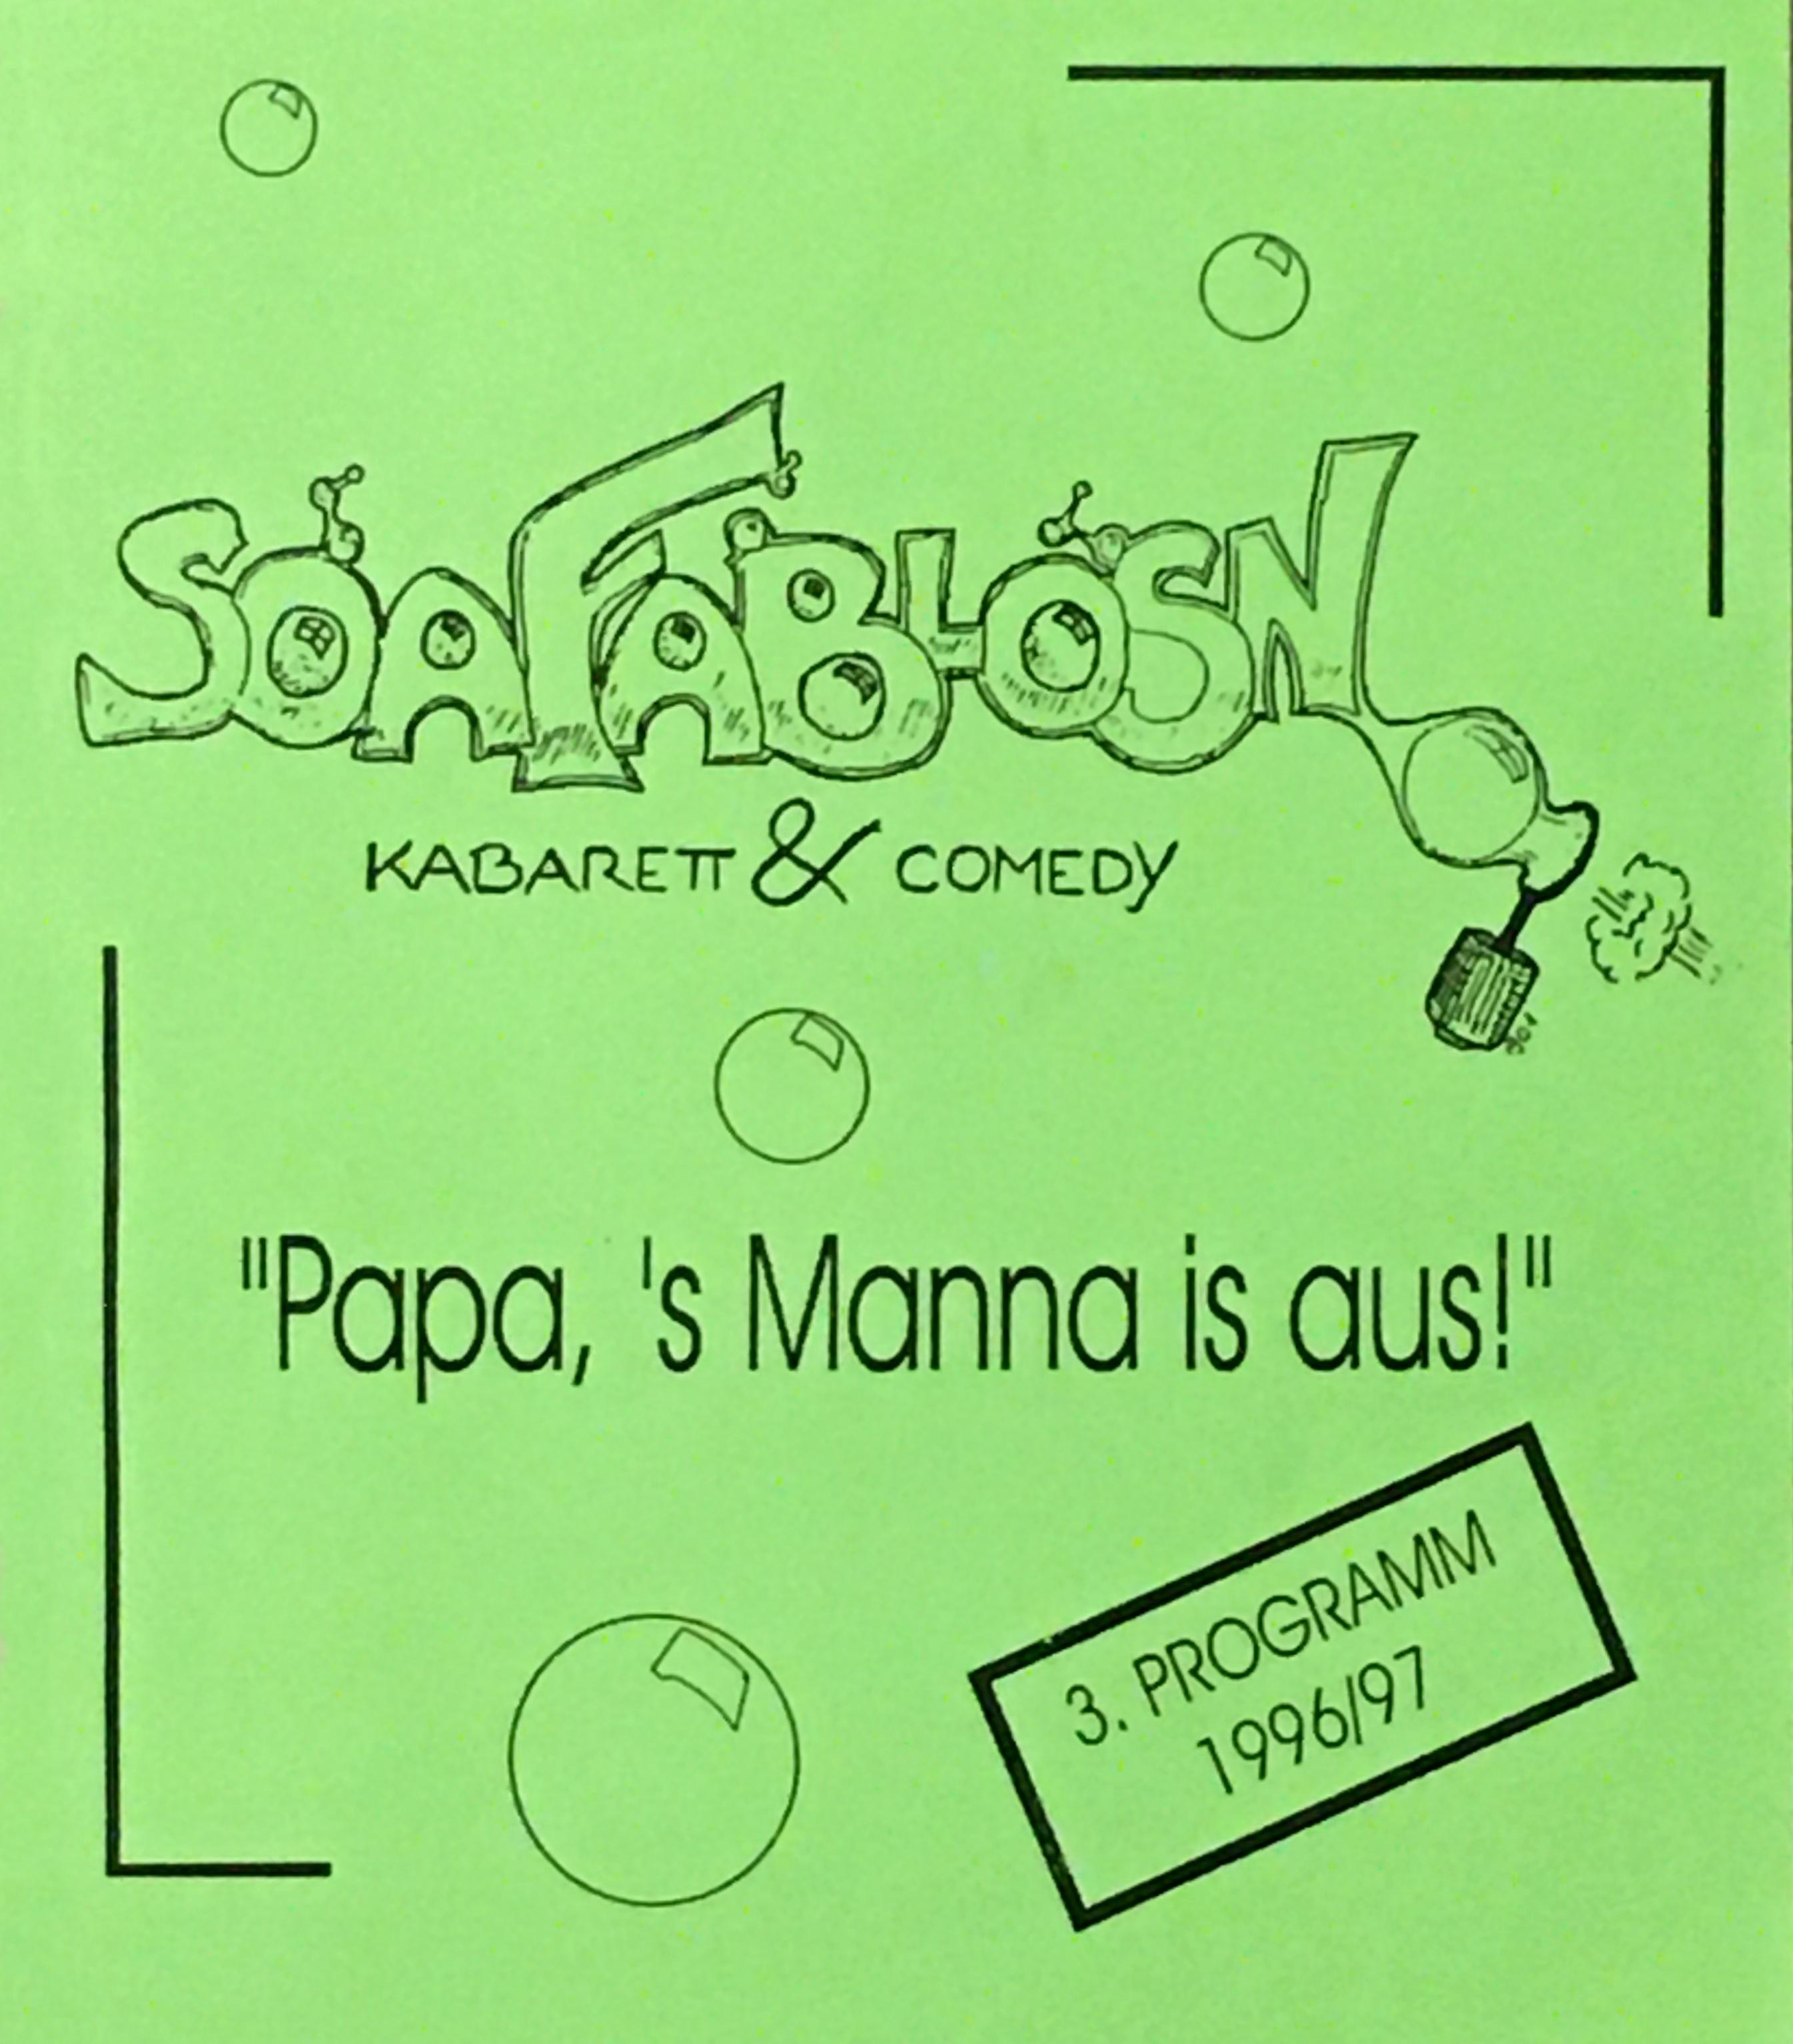 Papa's Manna is aus! 1996-1997